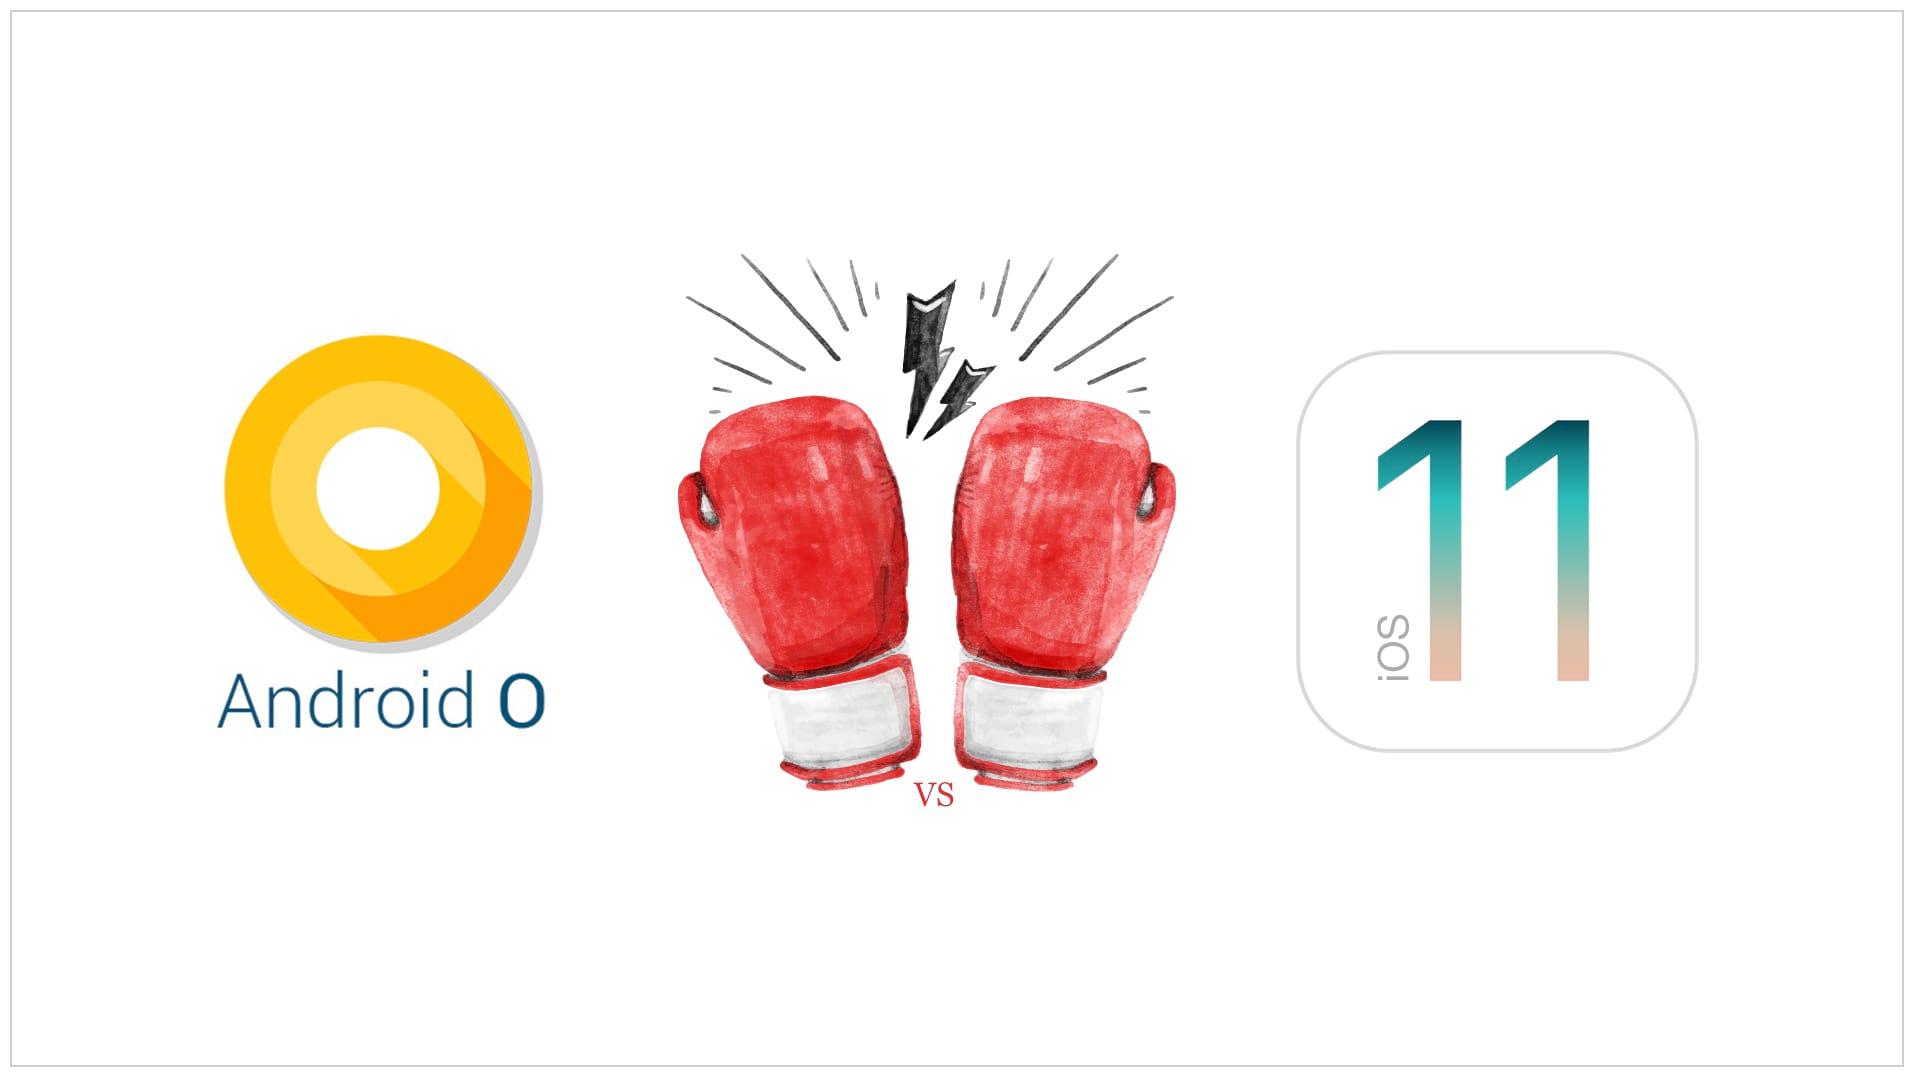 Android O Vs. iOS 11